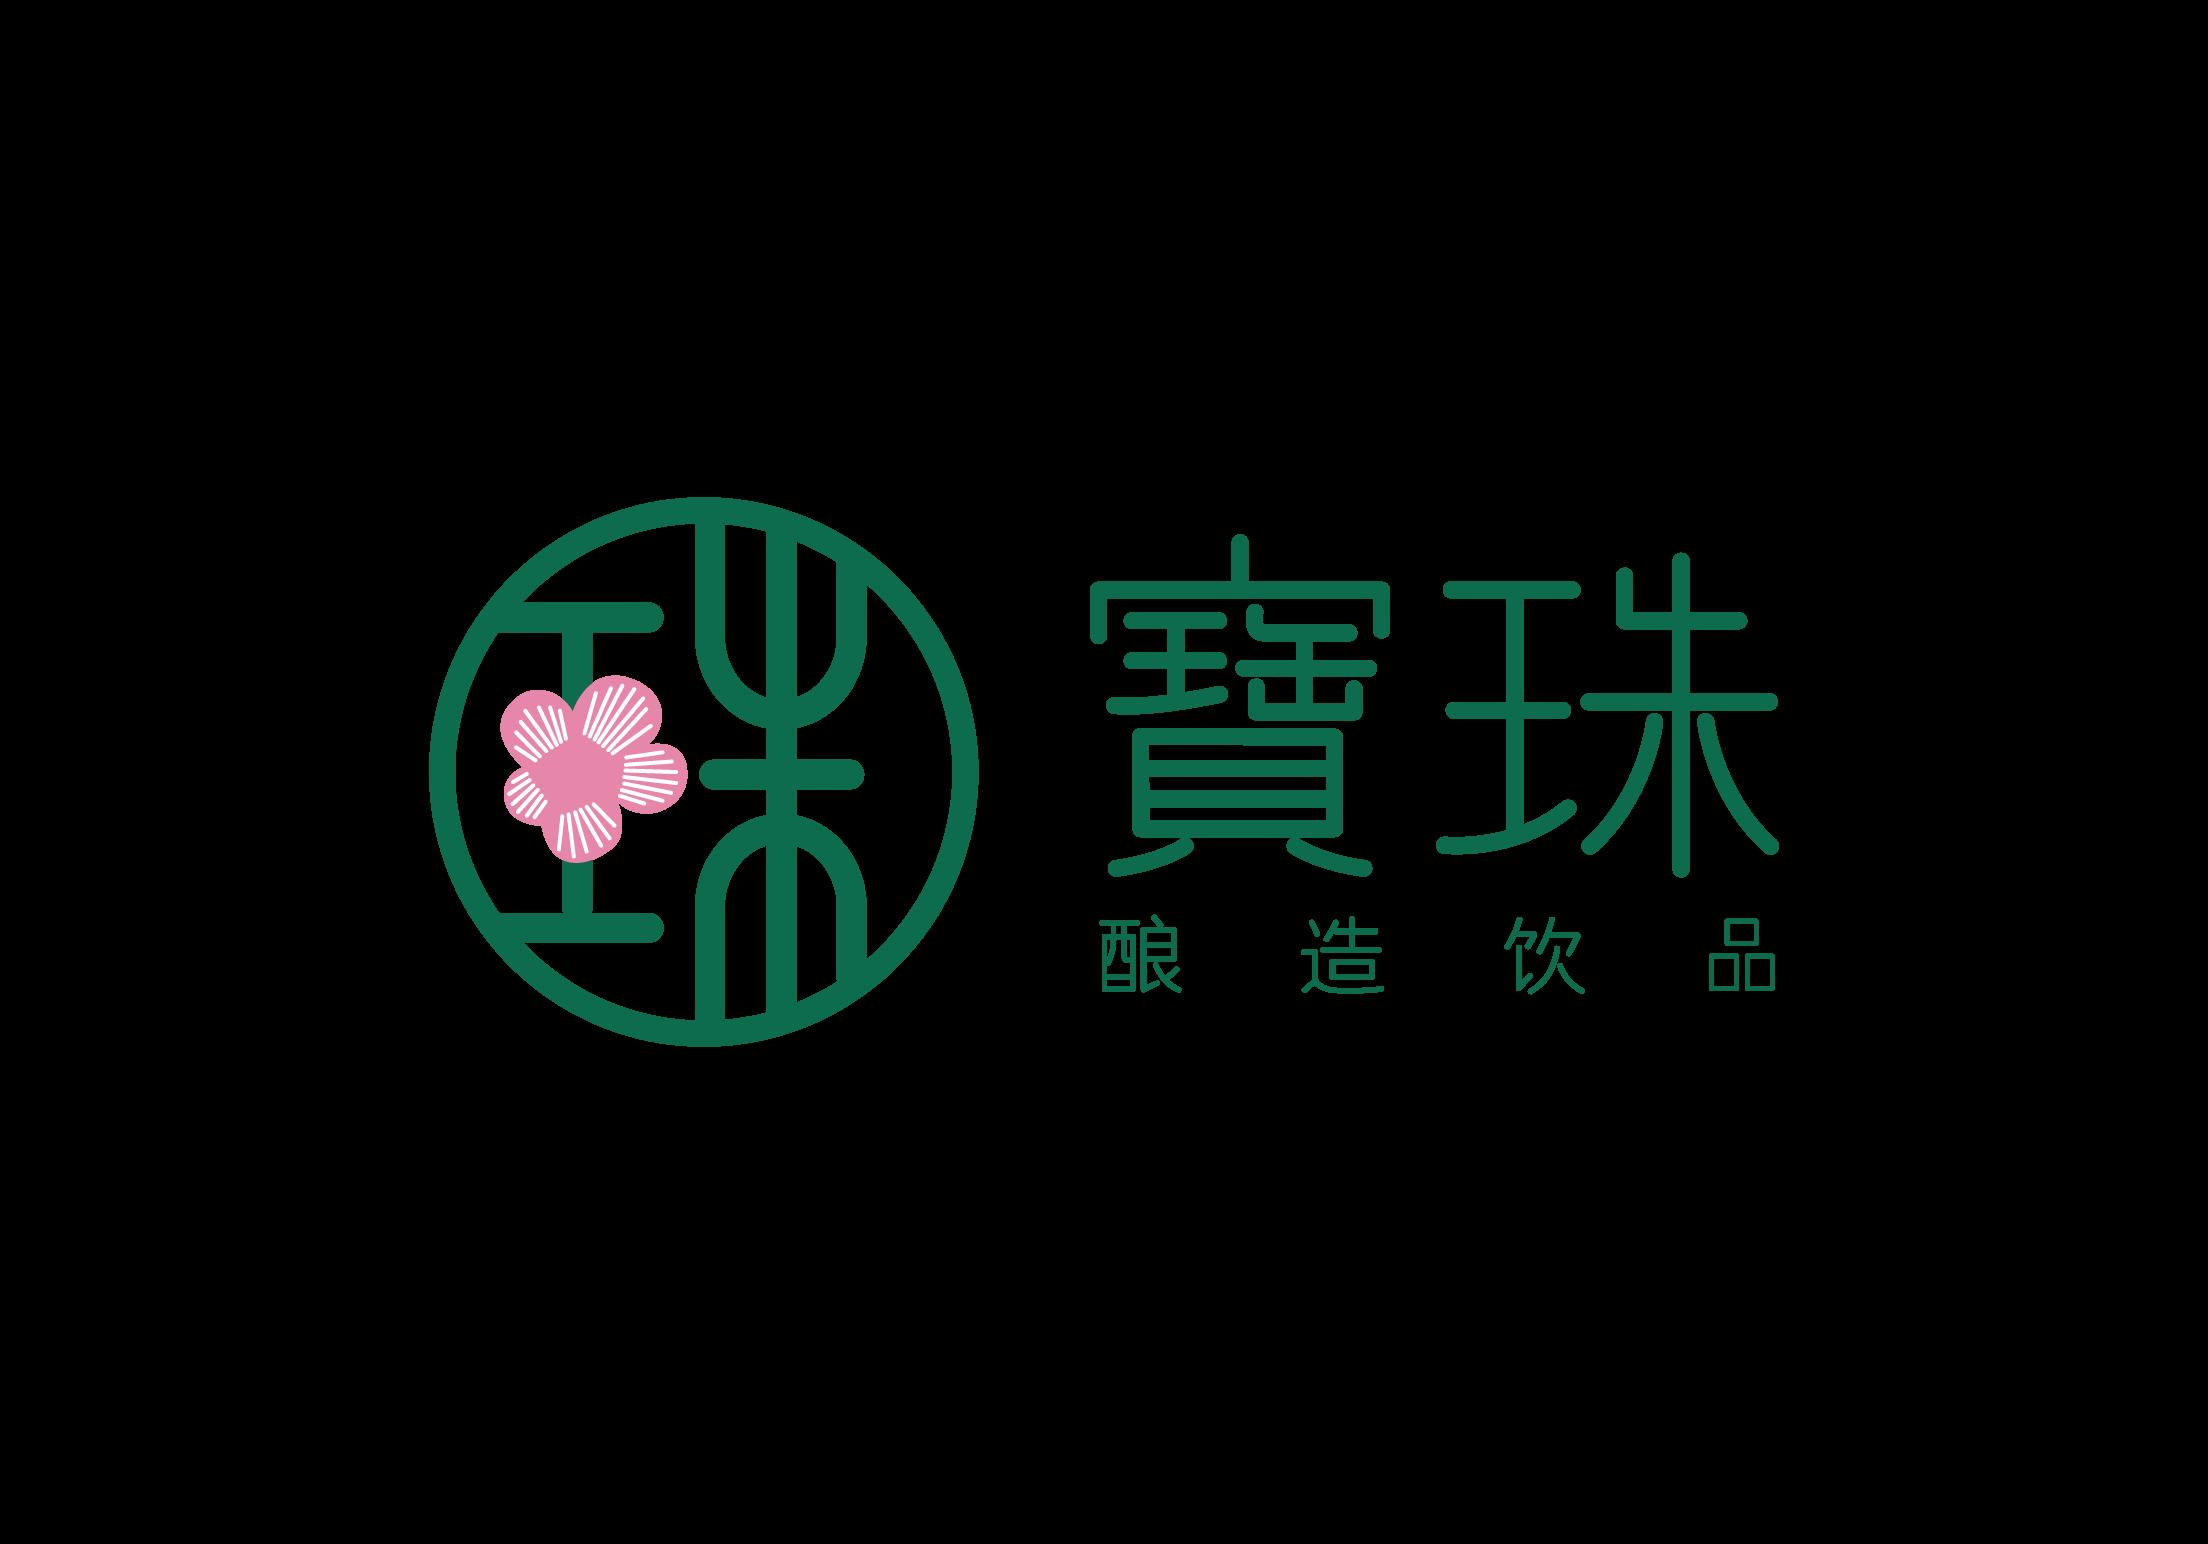 寶珠釀造品牌logo